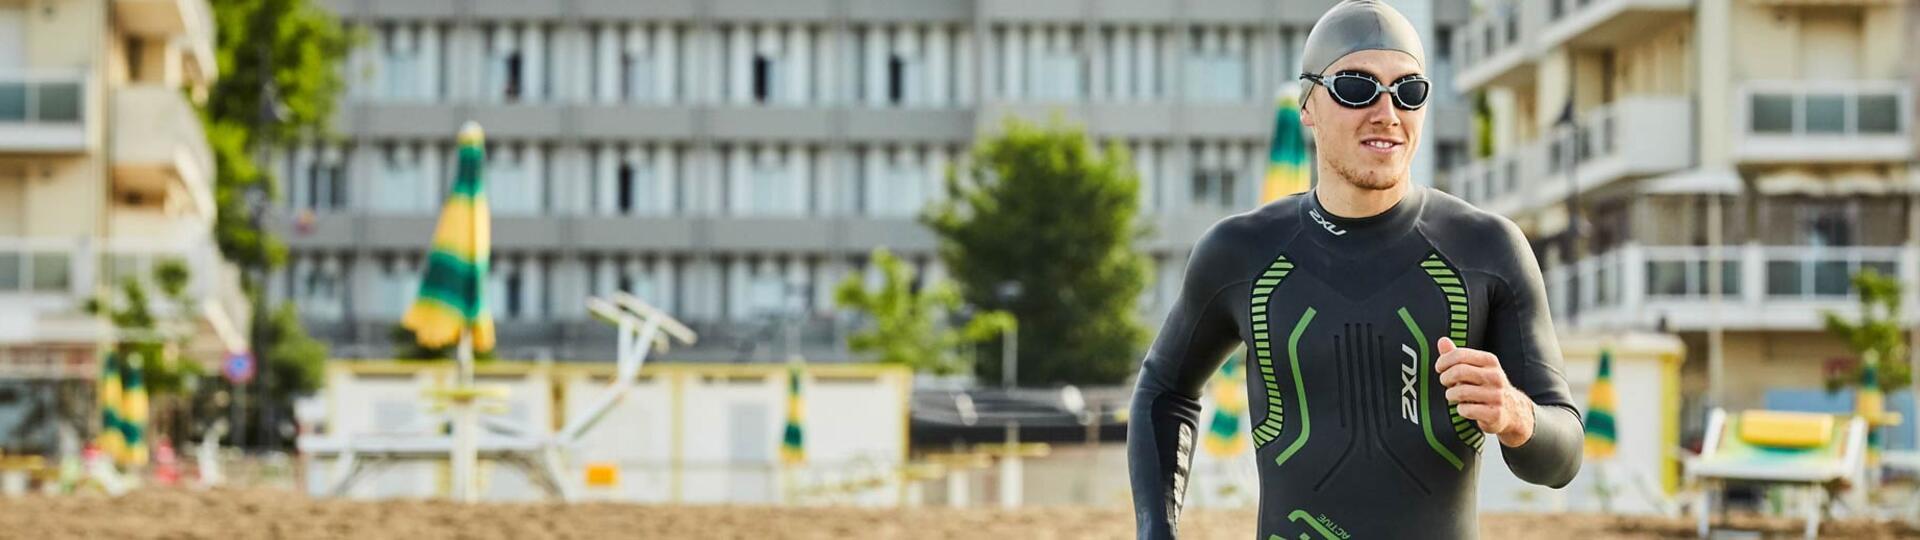 cycling.oxygenhotel de triathlon-rimini 014